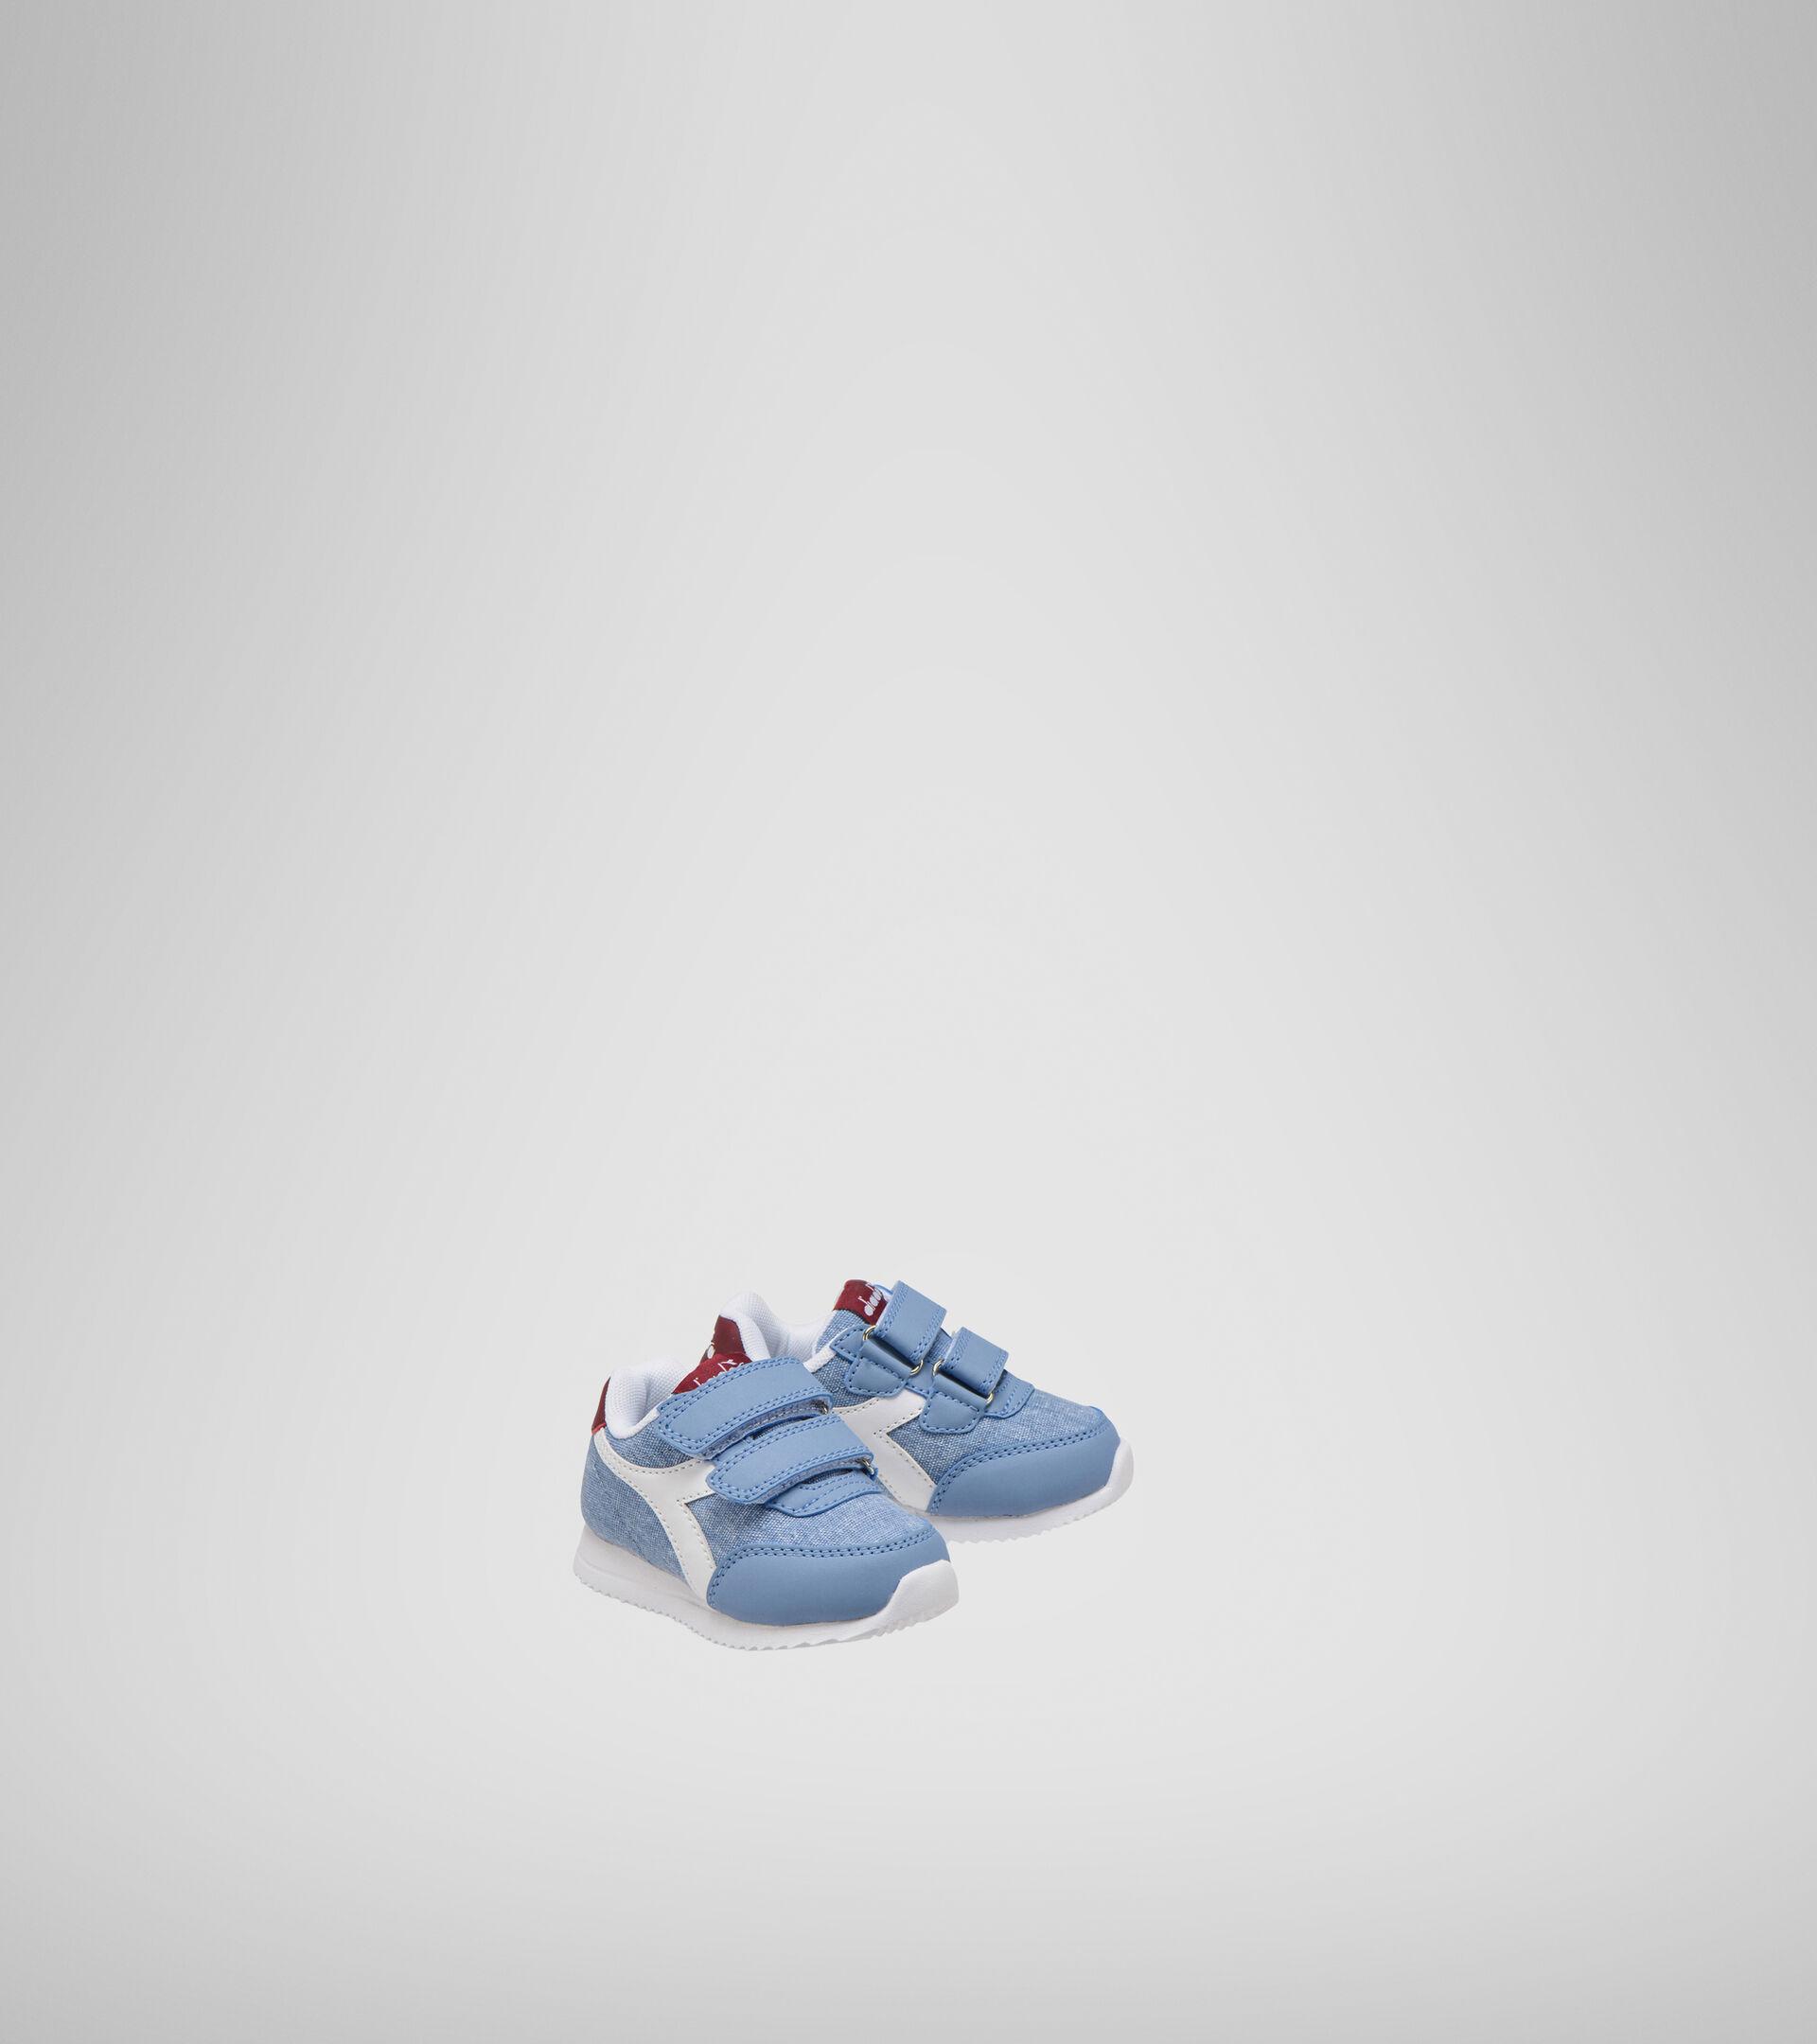 Chaussures de sport - Bambins 1-4 ans JOG LIGHT TD DENIM DELAVE/ZINFANDEL - Diadora